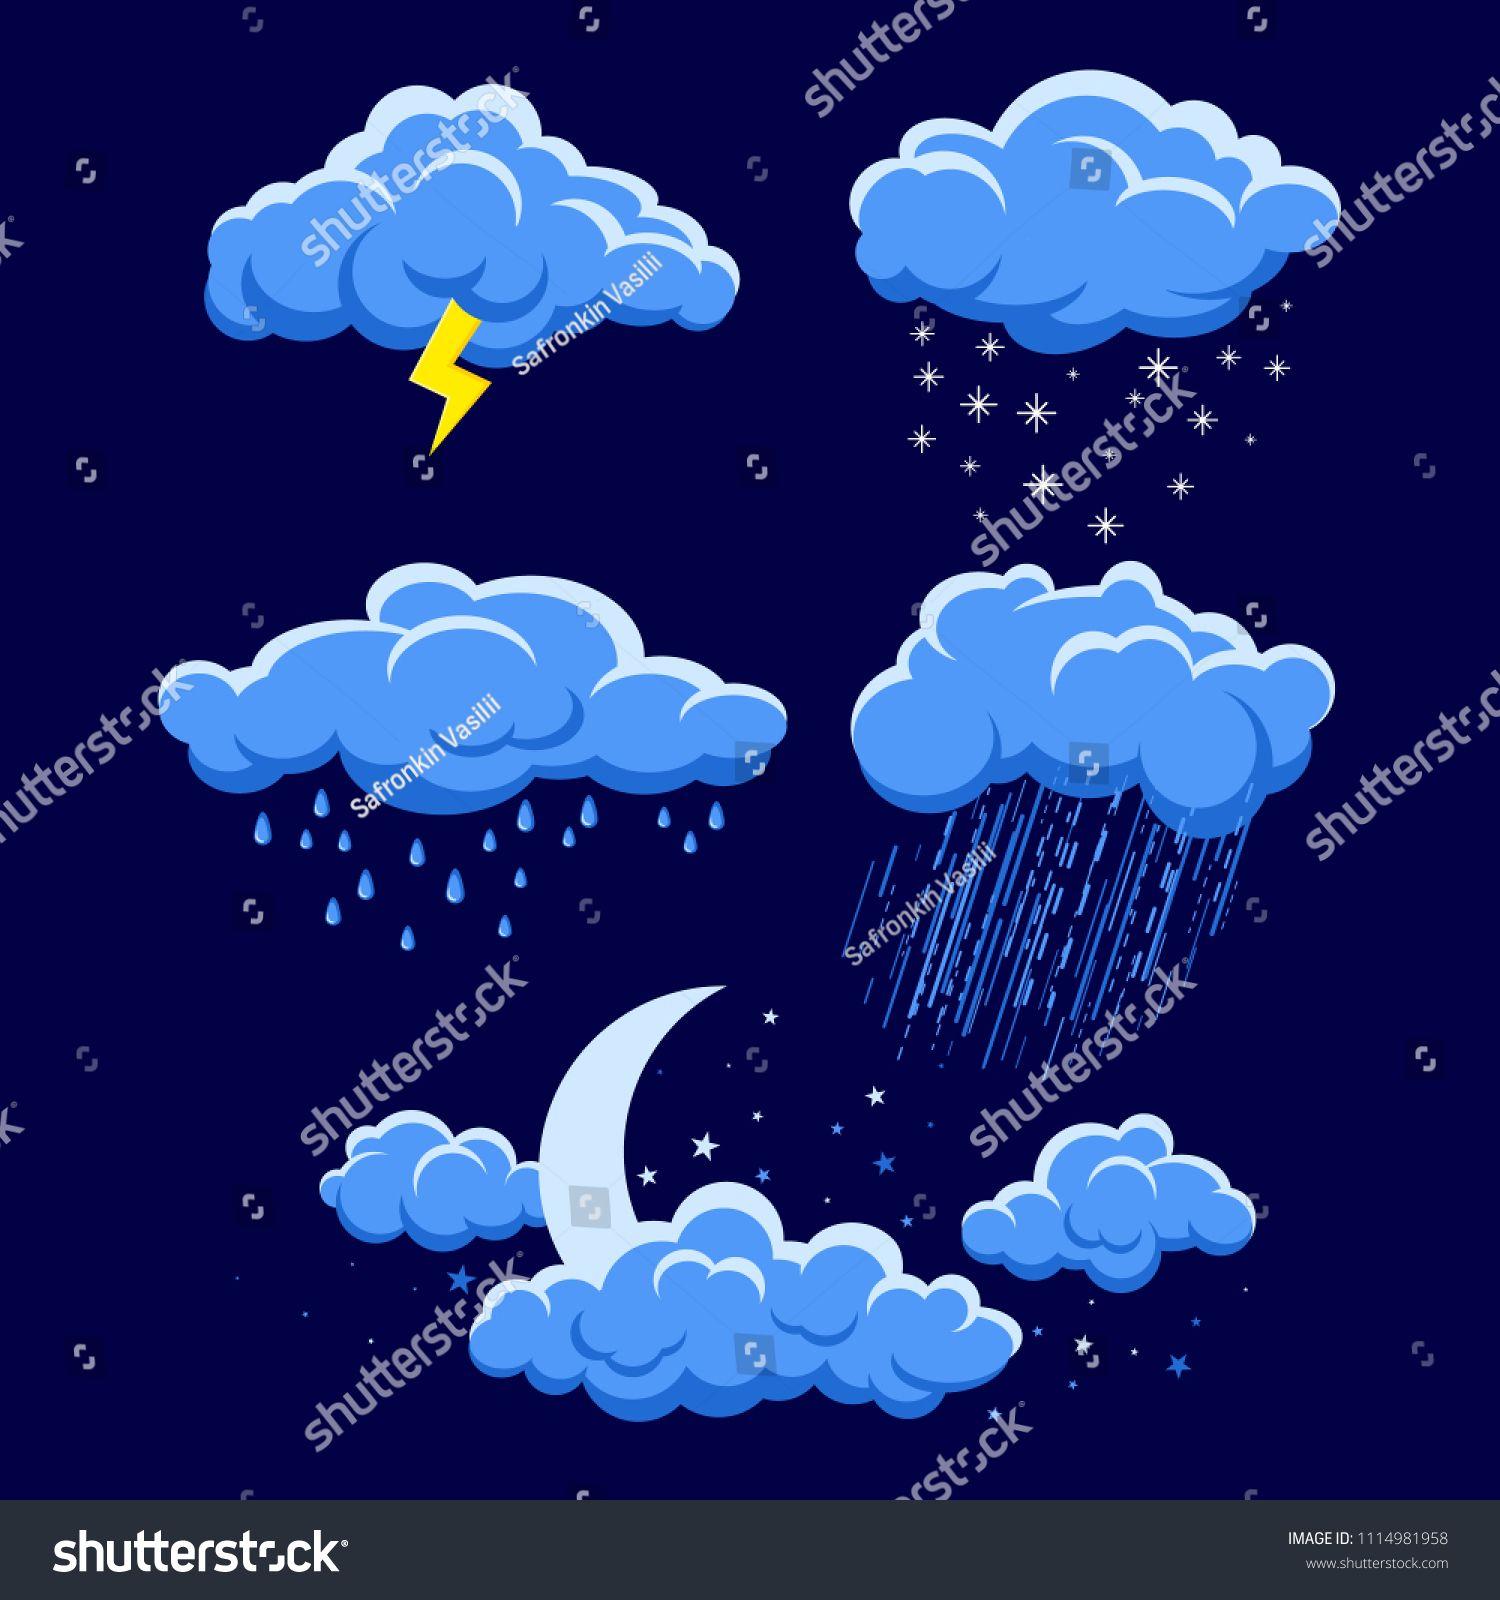 Set Of Cartoon Clouds On Dark Blue Night Sky Illustration Of Different Weather Rain Storm Lightning Snow M Cartoon Clouds Night Clouds Cloud Illustration